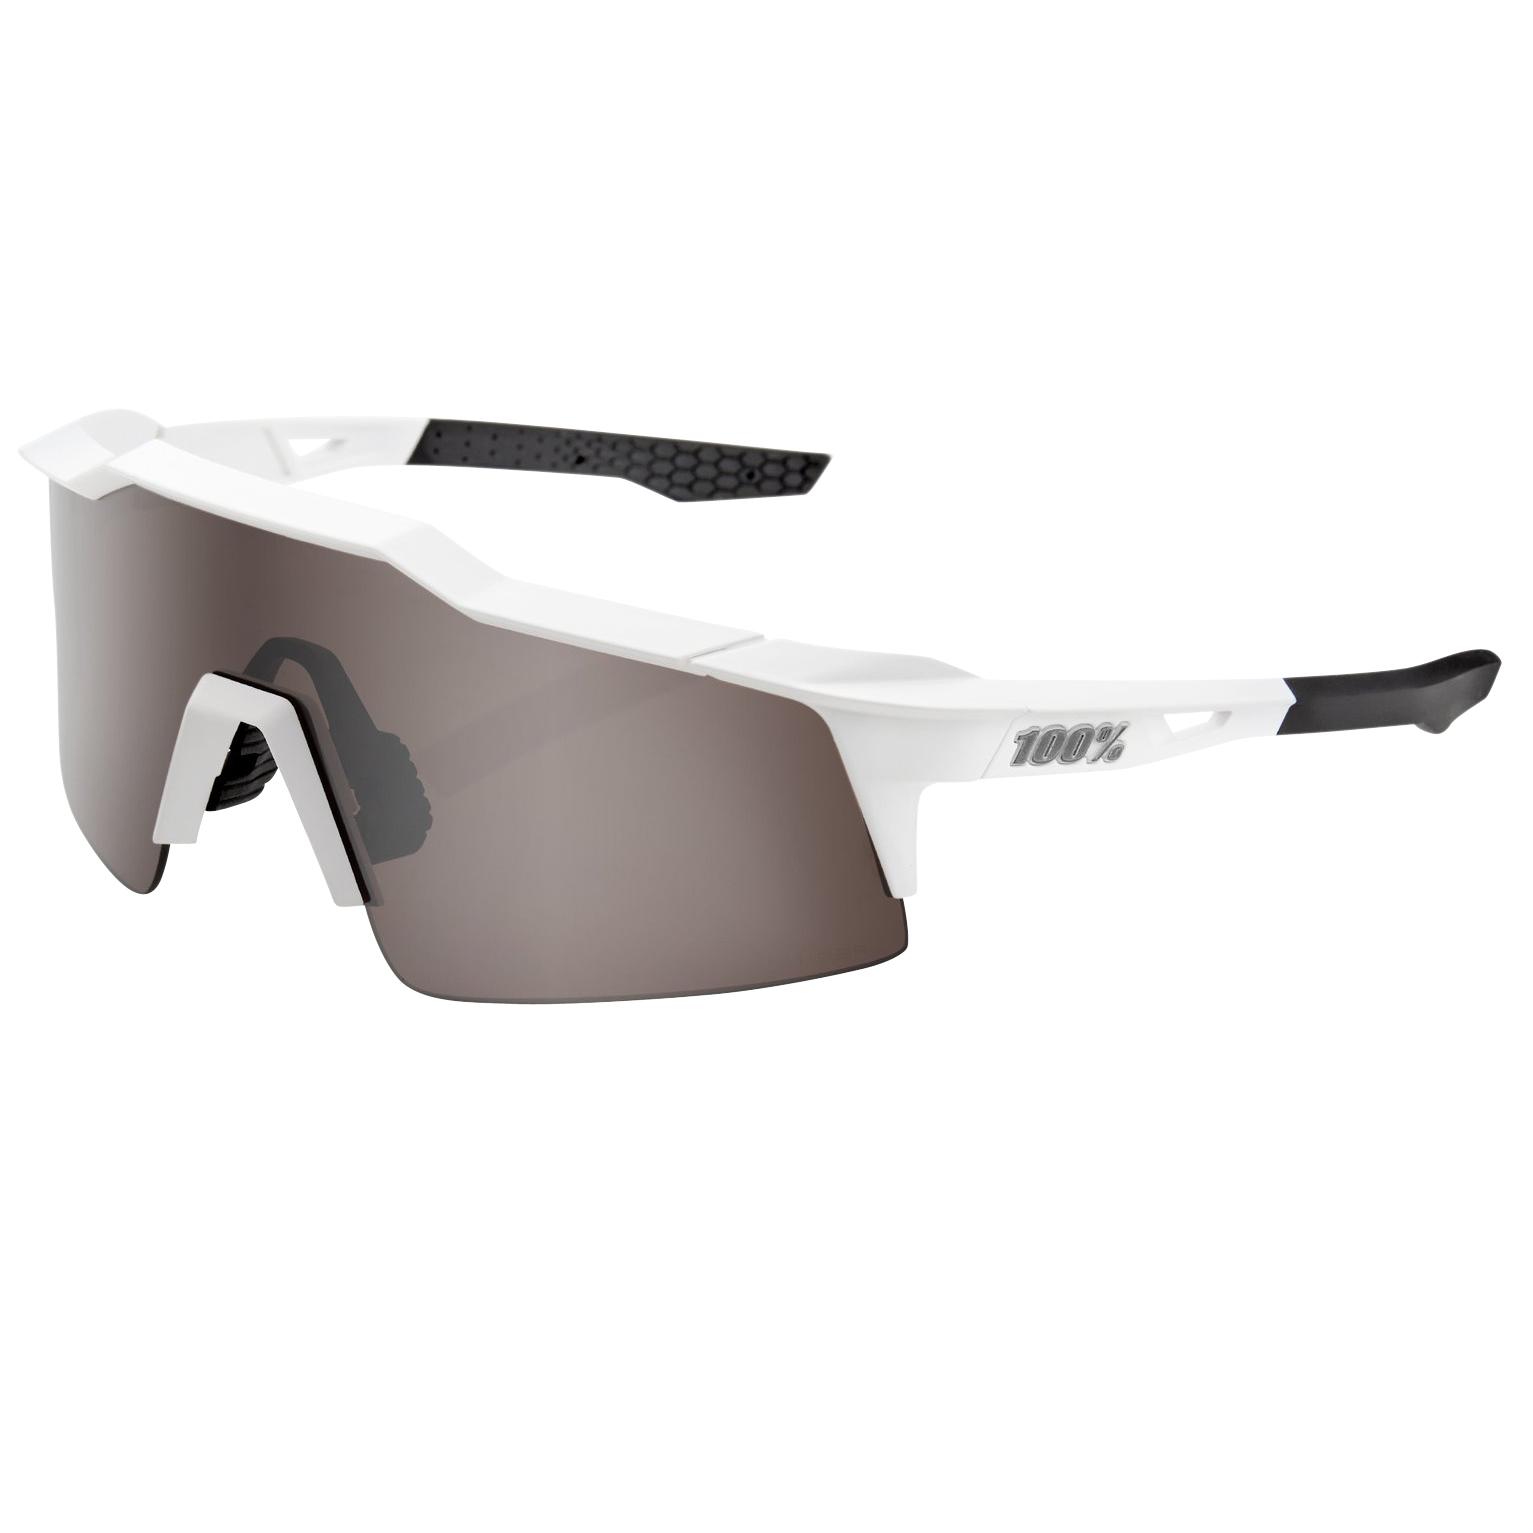 Imagen de 100% Speedcraft - Small - HiPER Mirror Glasses - Matte White/Silver + Clear